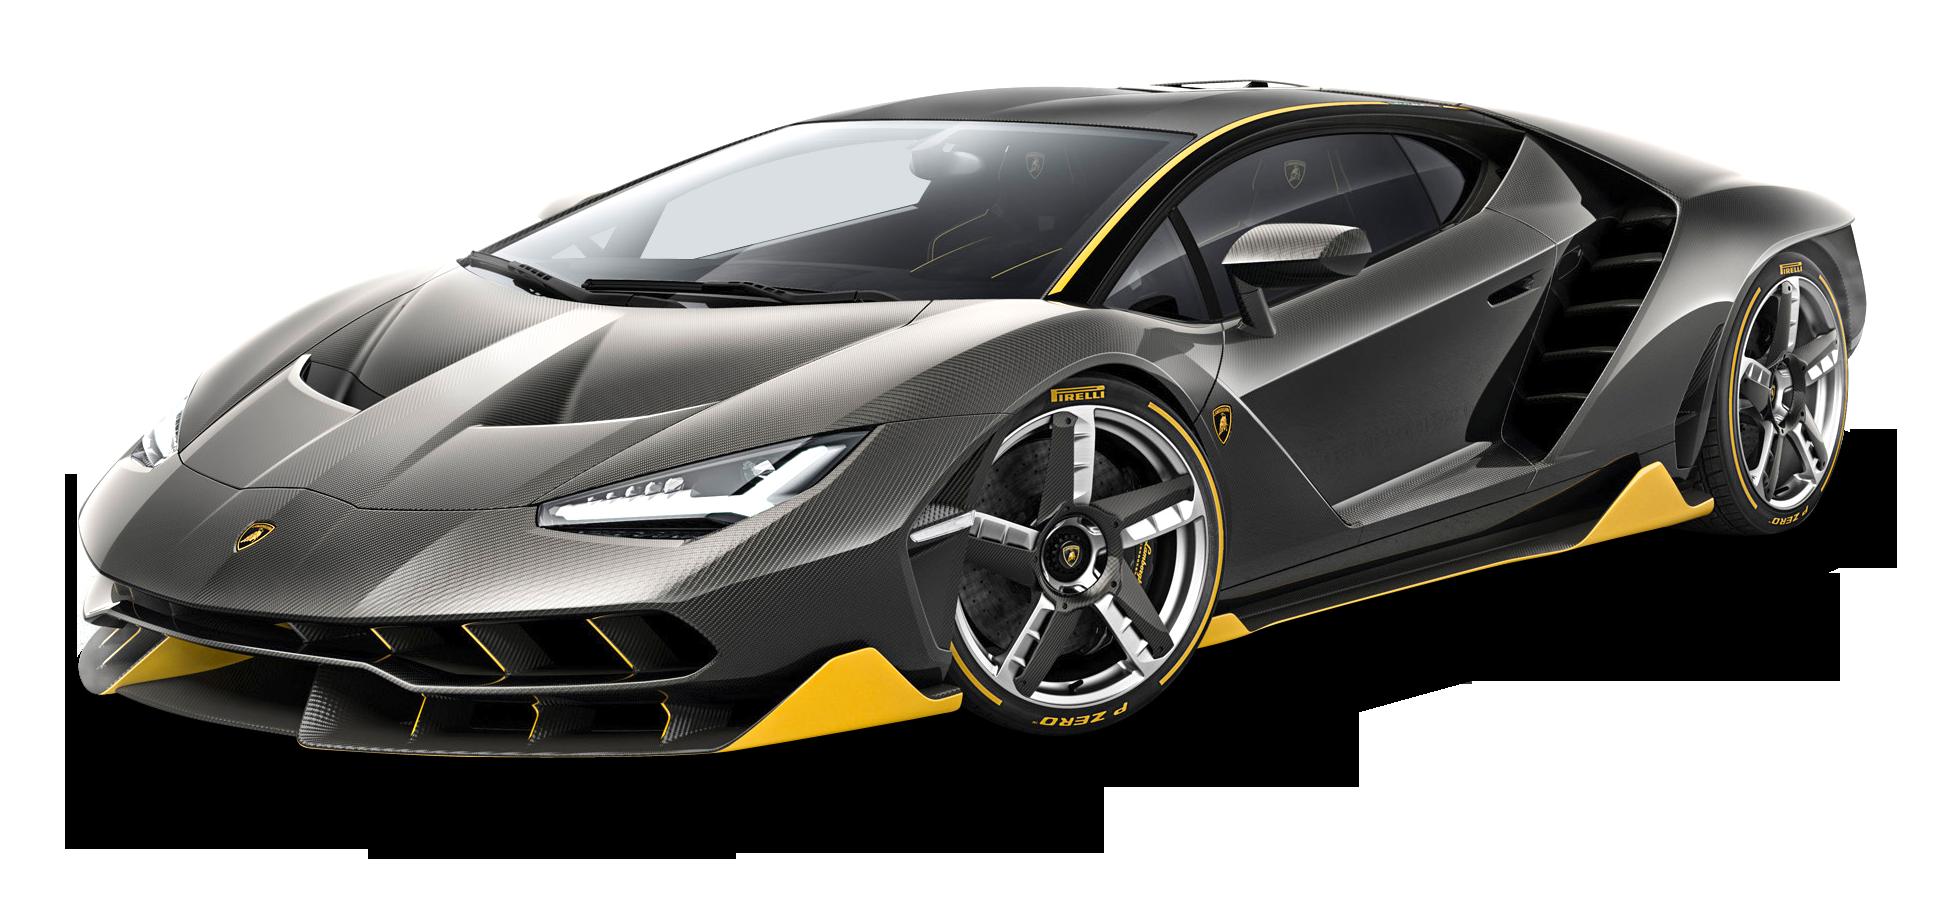 Black Lamborghini Centenario Lp 770 4 Car Png Image Purepng Free